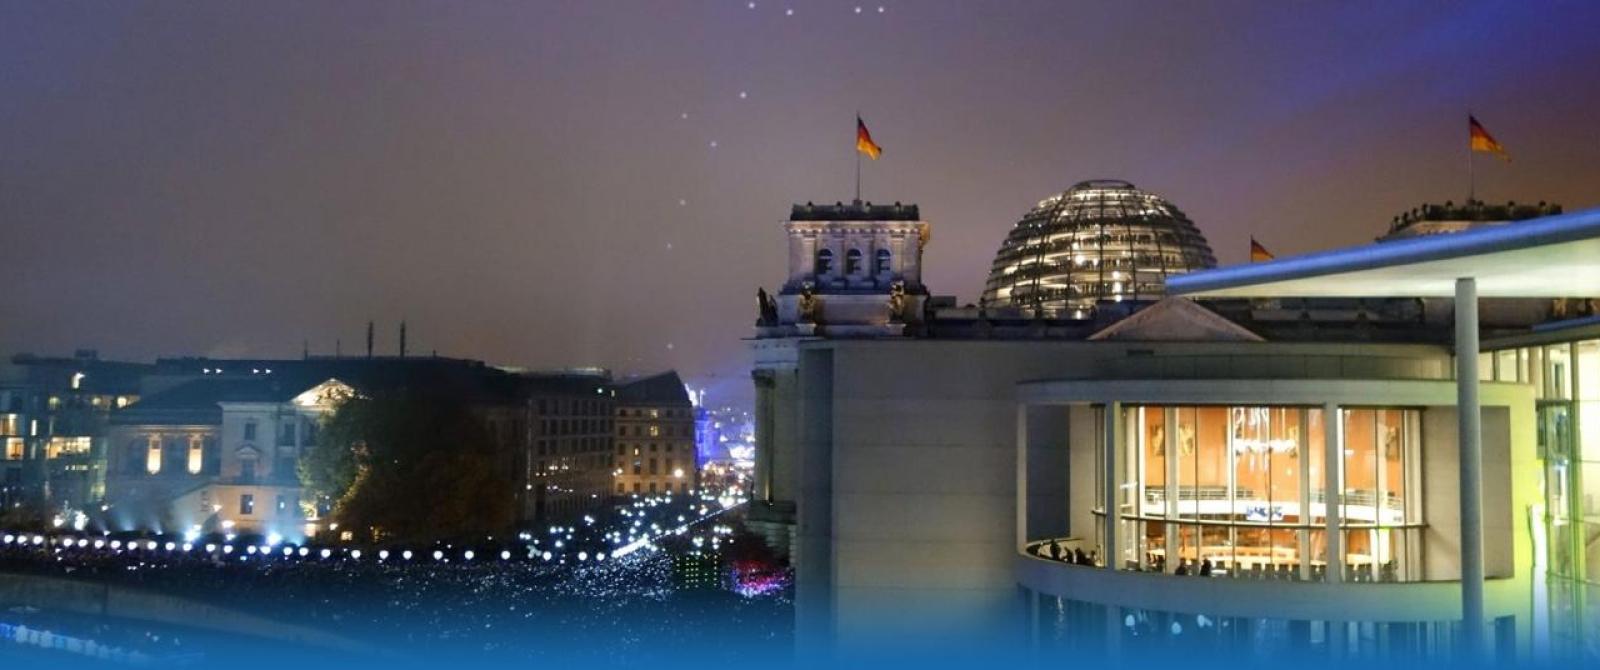 oliver-grundmann-stade-rotenburg-politiker-cdu-berlin-bundestag-mdb (53)